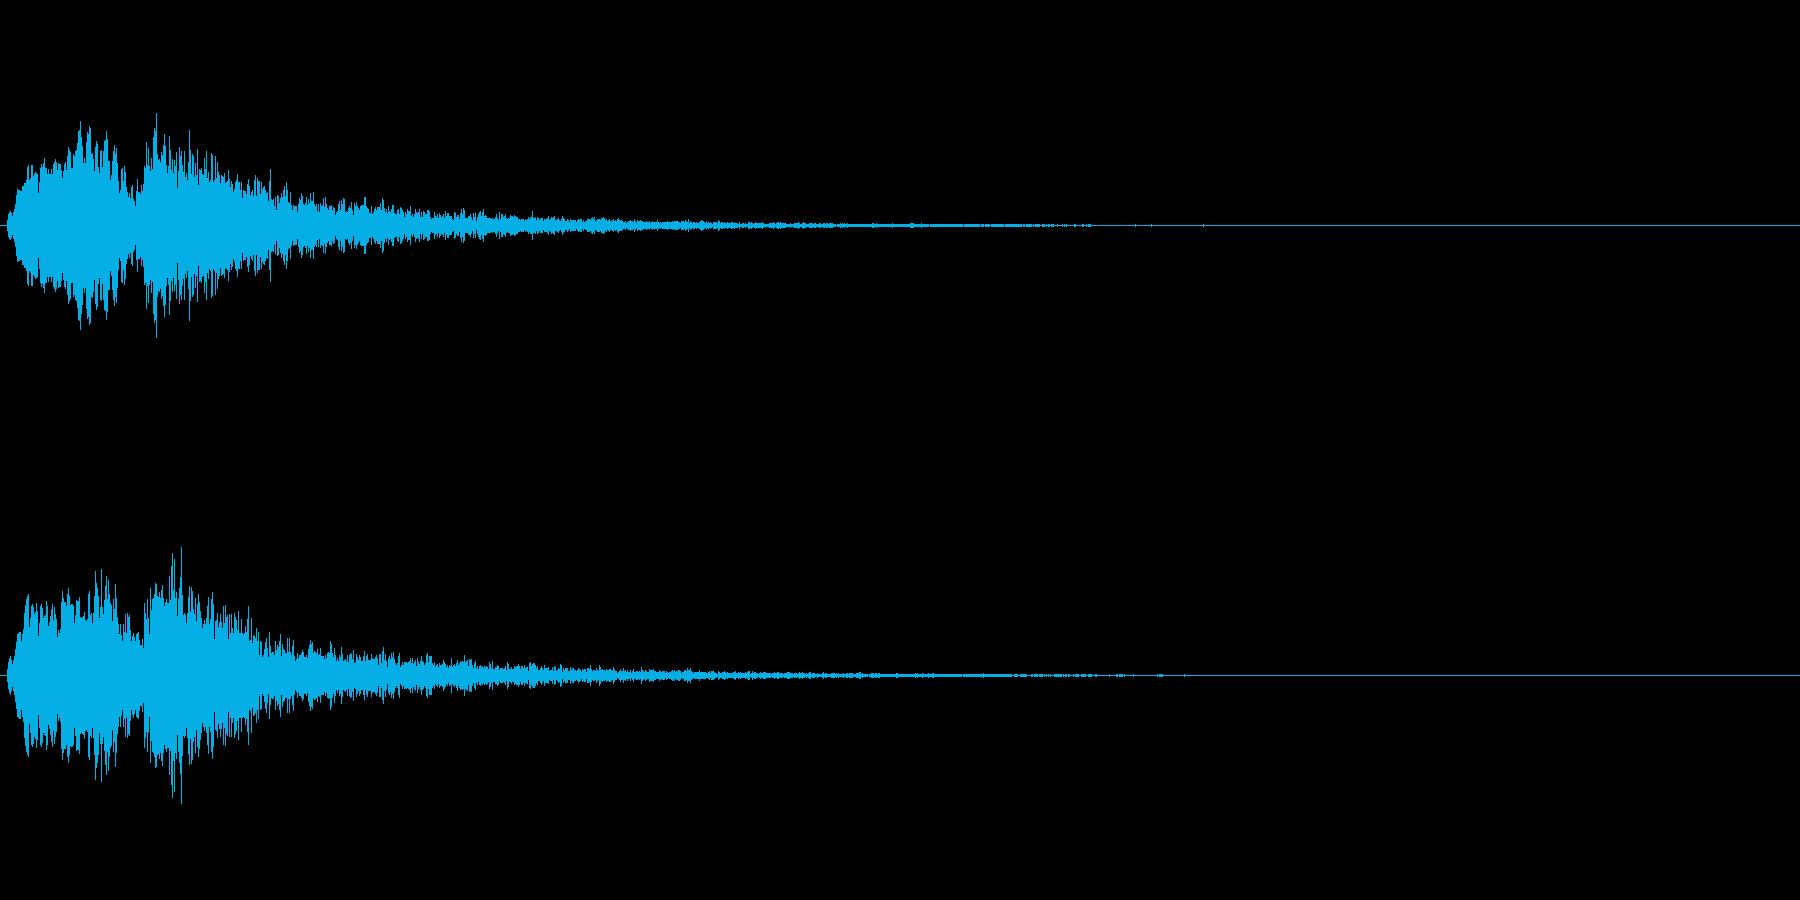 Vox 不気味な鳴き声 ホラーSE 3の再生済みの波形